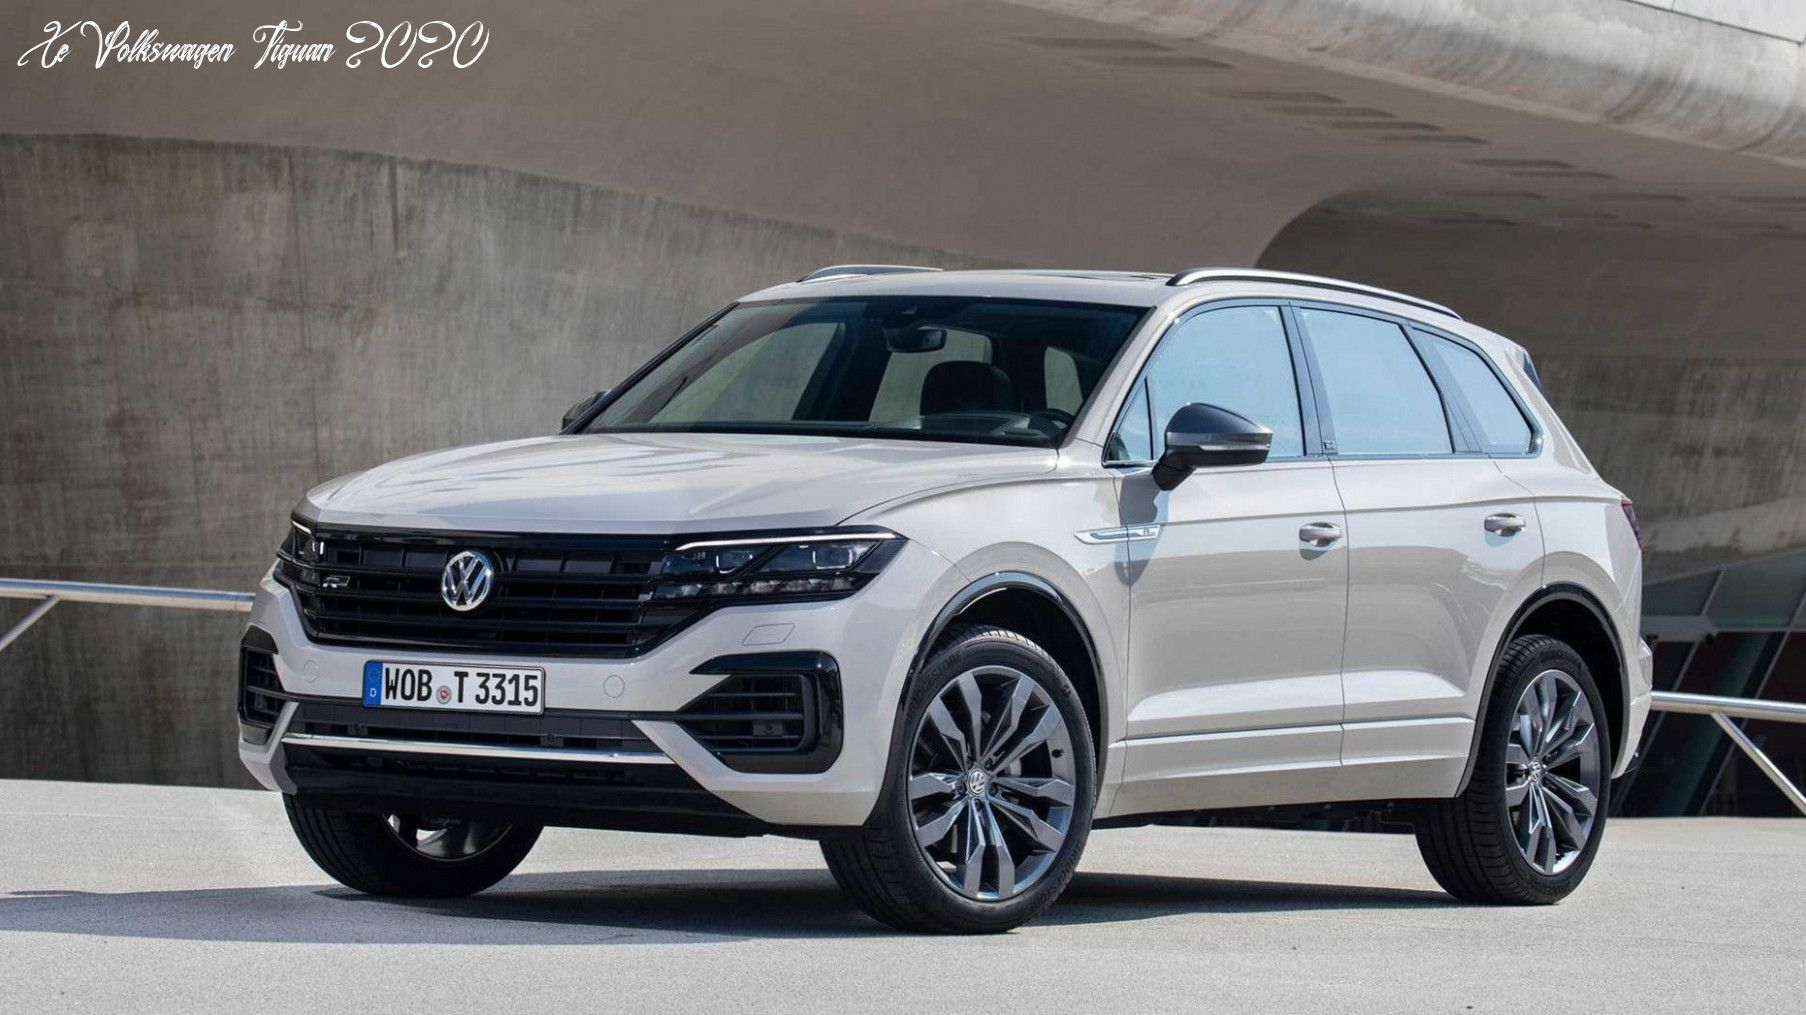 Xe Volkswagen Tiguan 2020 Performance And New Engine Em 2020 Volkswagem Carros